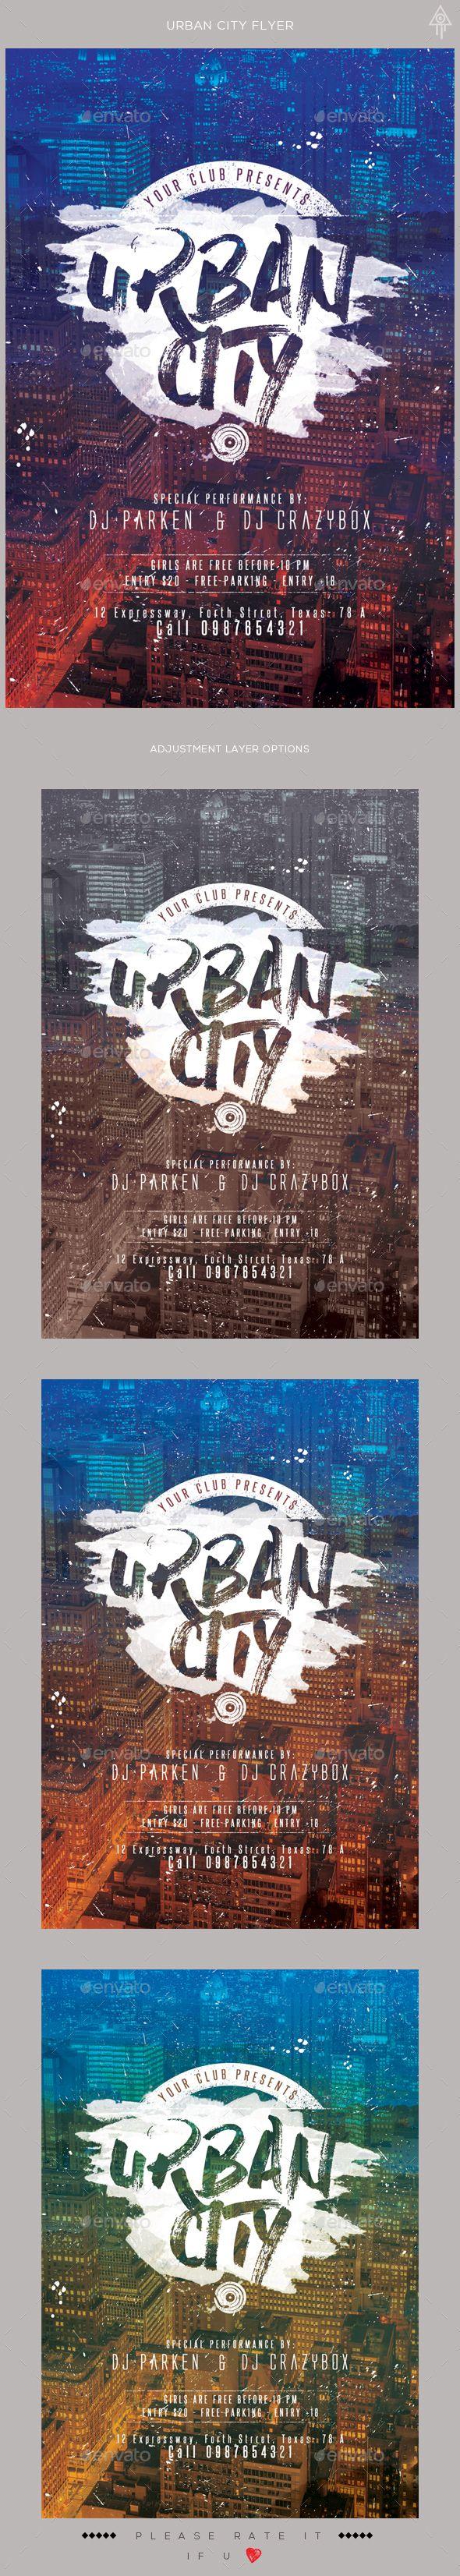 Urban City Flyer Template PSD. Download here: https://graphicriver.net/item/urban-city-flyer/17112392?ref=ksioks